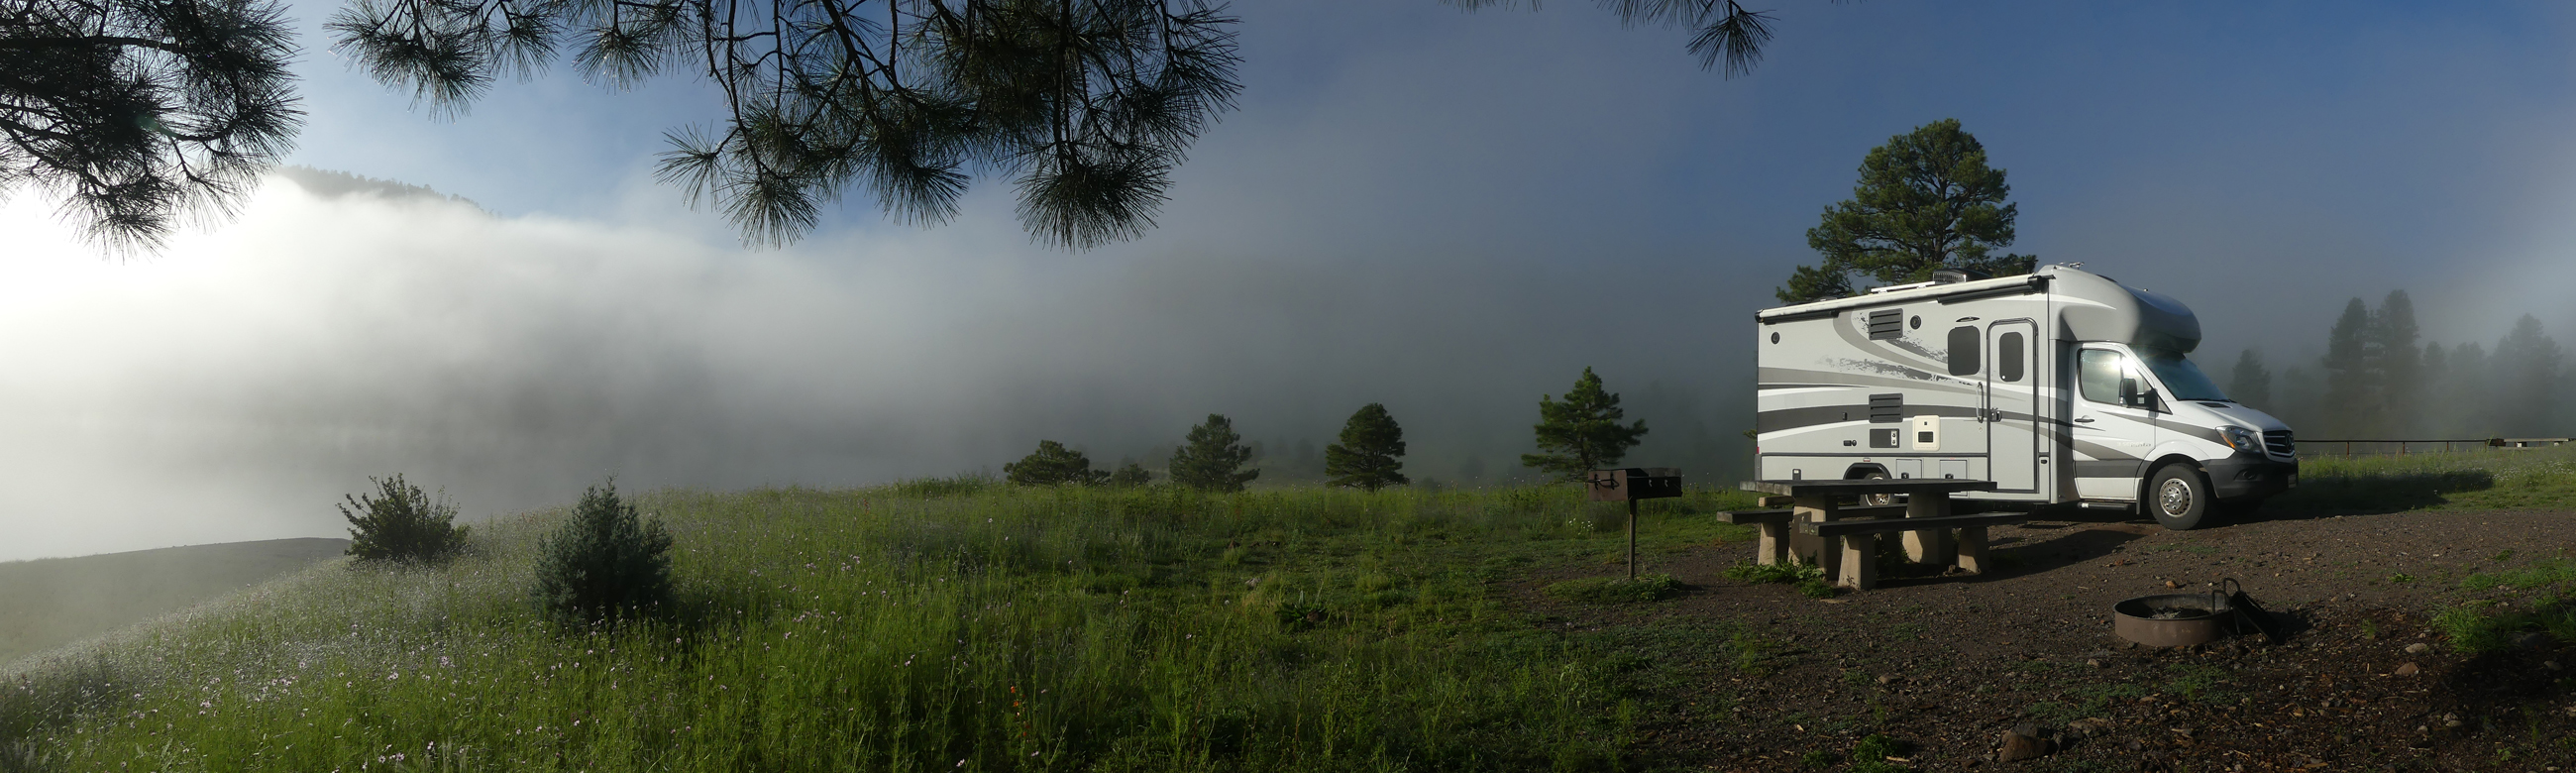 RV in the fog